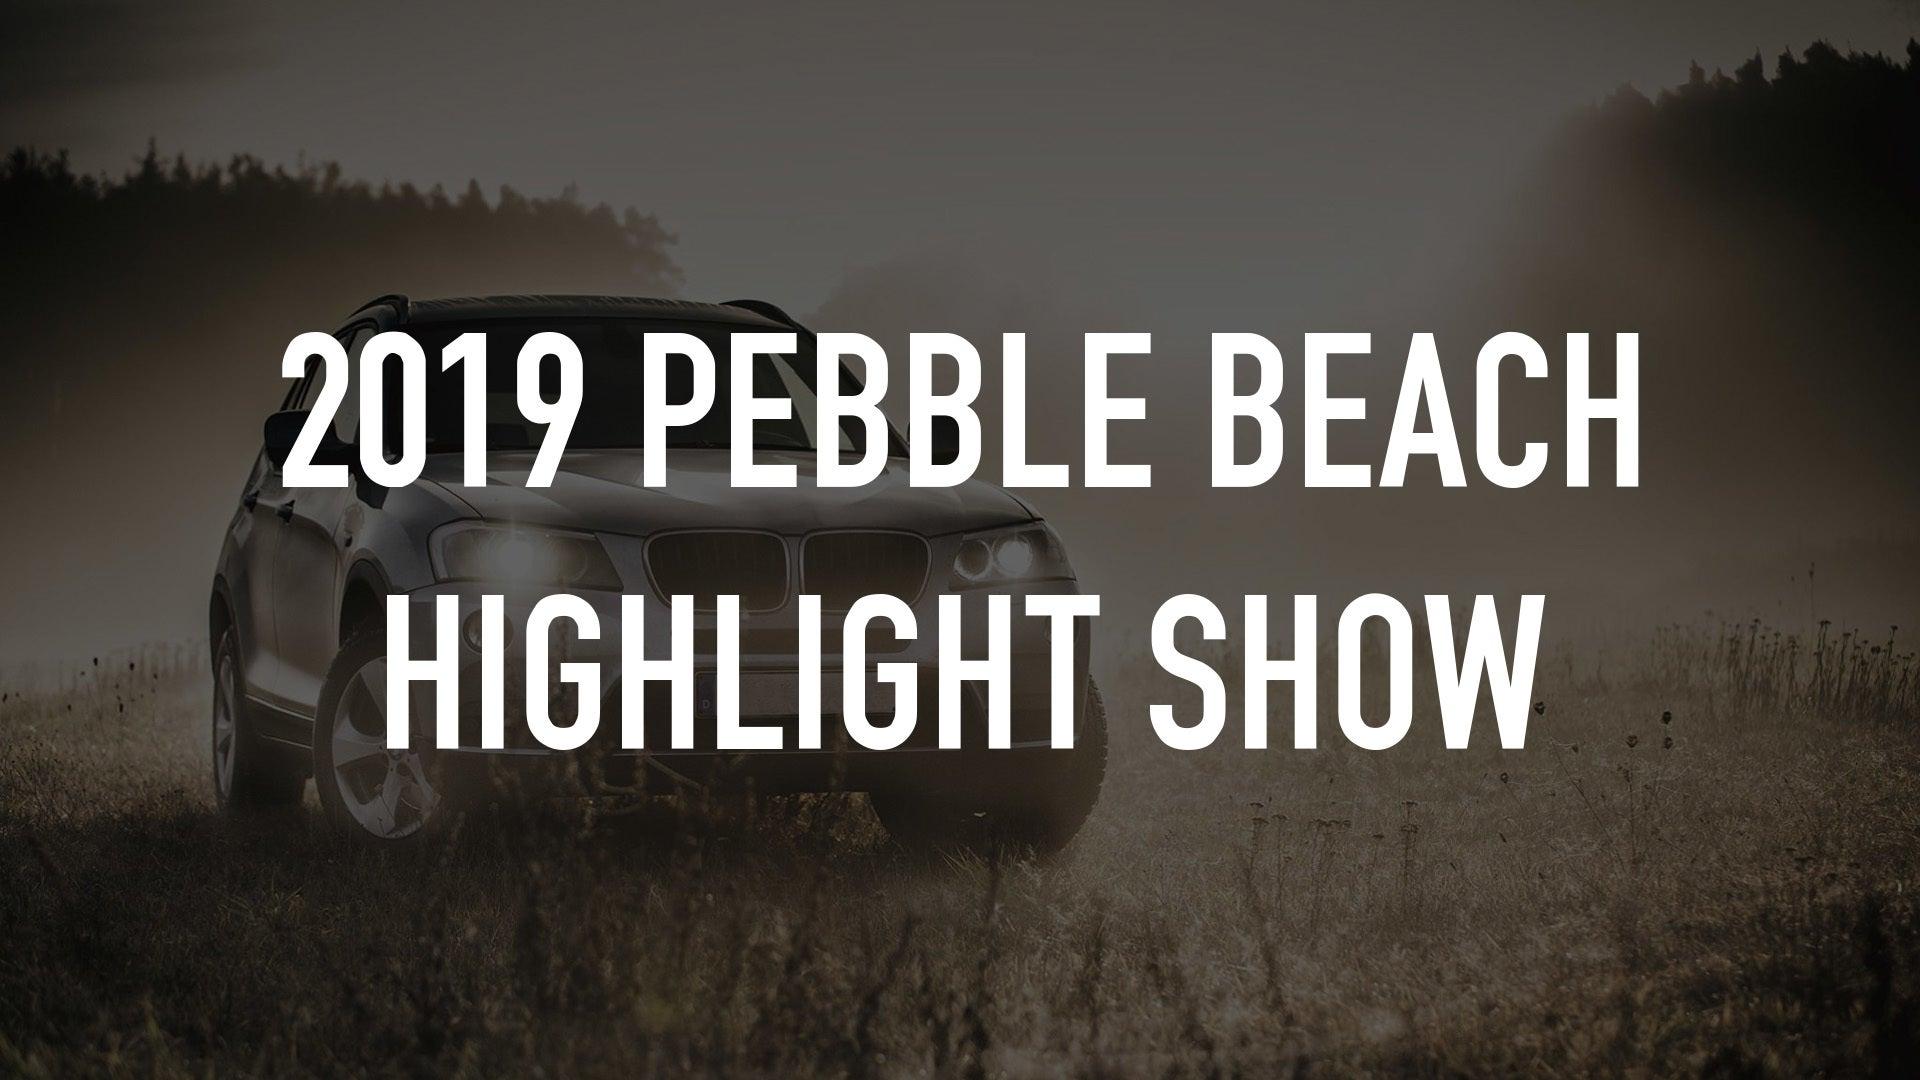 2019 Pebble Beach Highlight Show